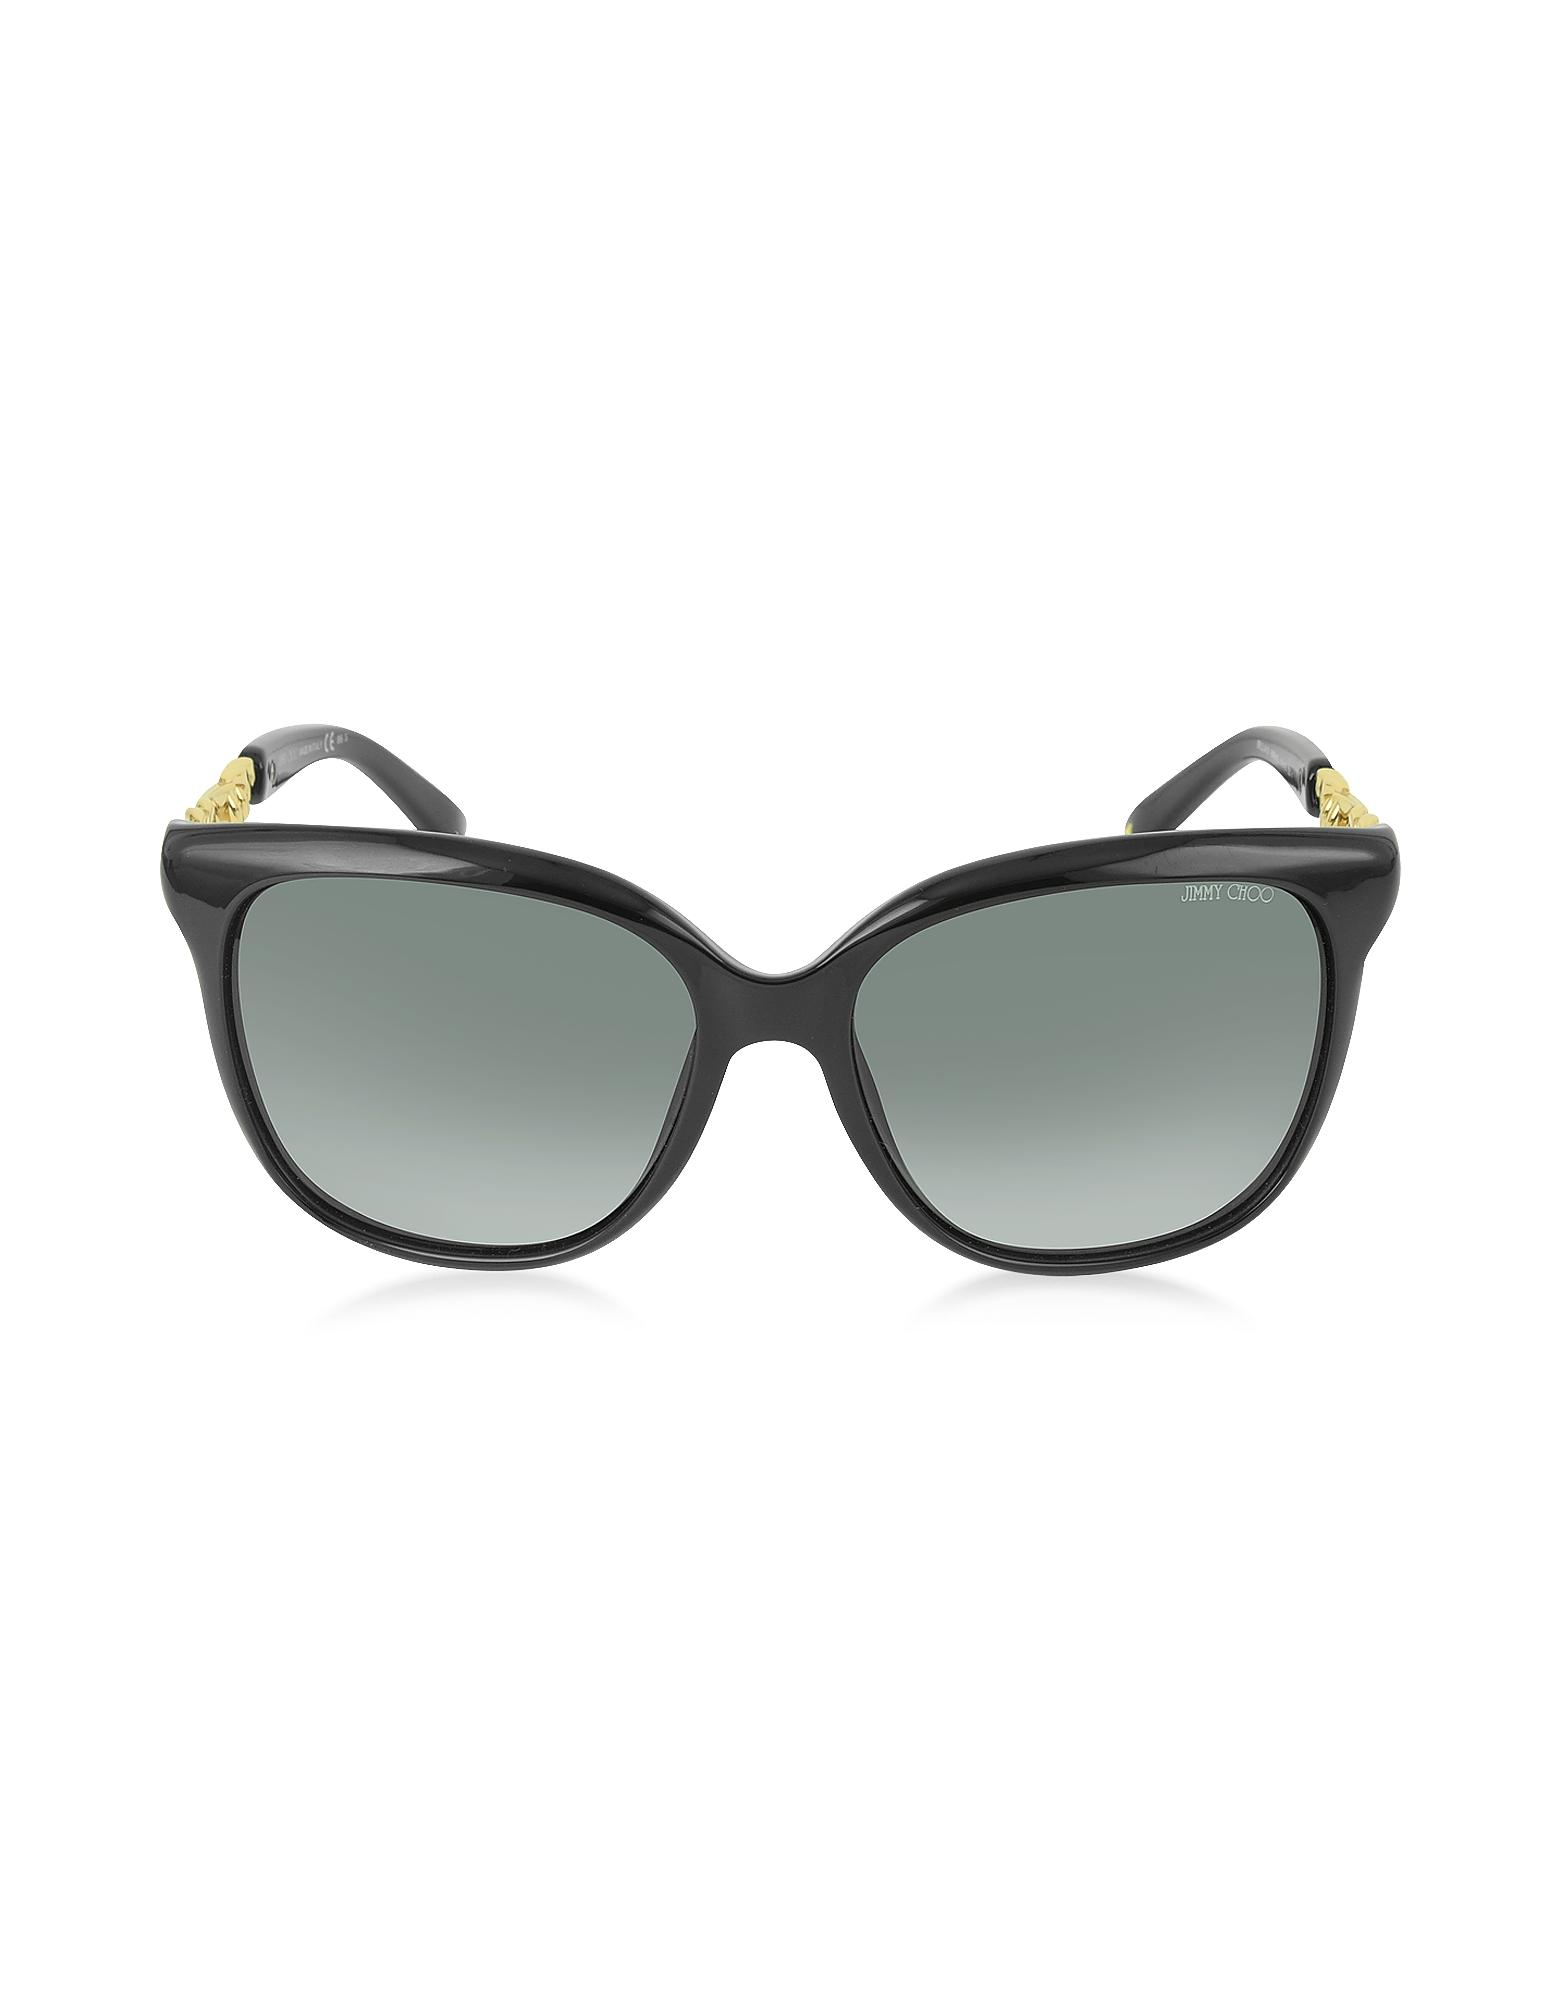 d023a3cf53ee Jimmy Choo - Black Paula/s Acetate Women's Sunglasses - Lyst. View  fullscreen